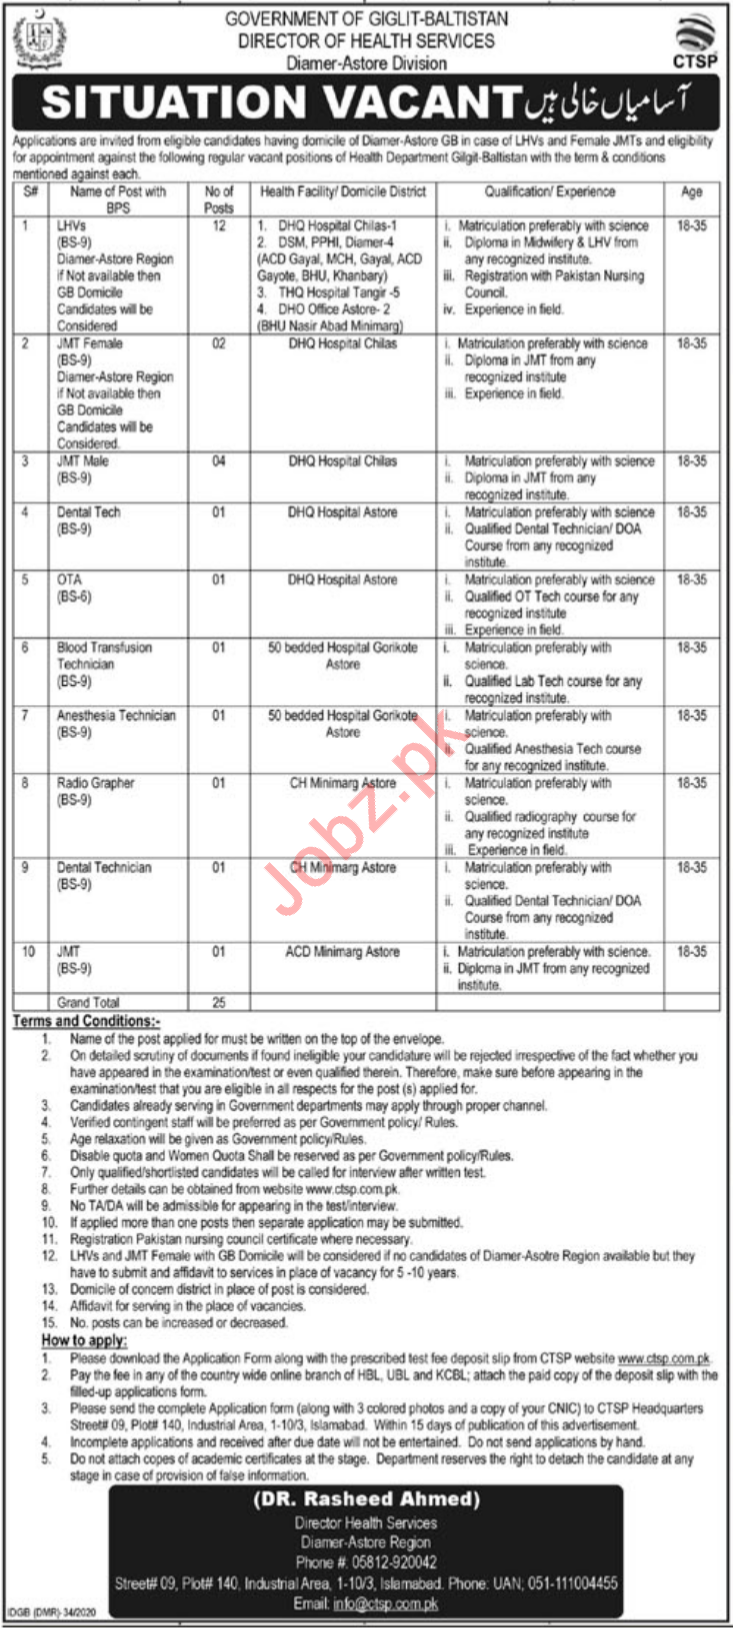 Health Department Gilgit Baltistan Jobs 2020 Via CTSP